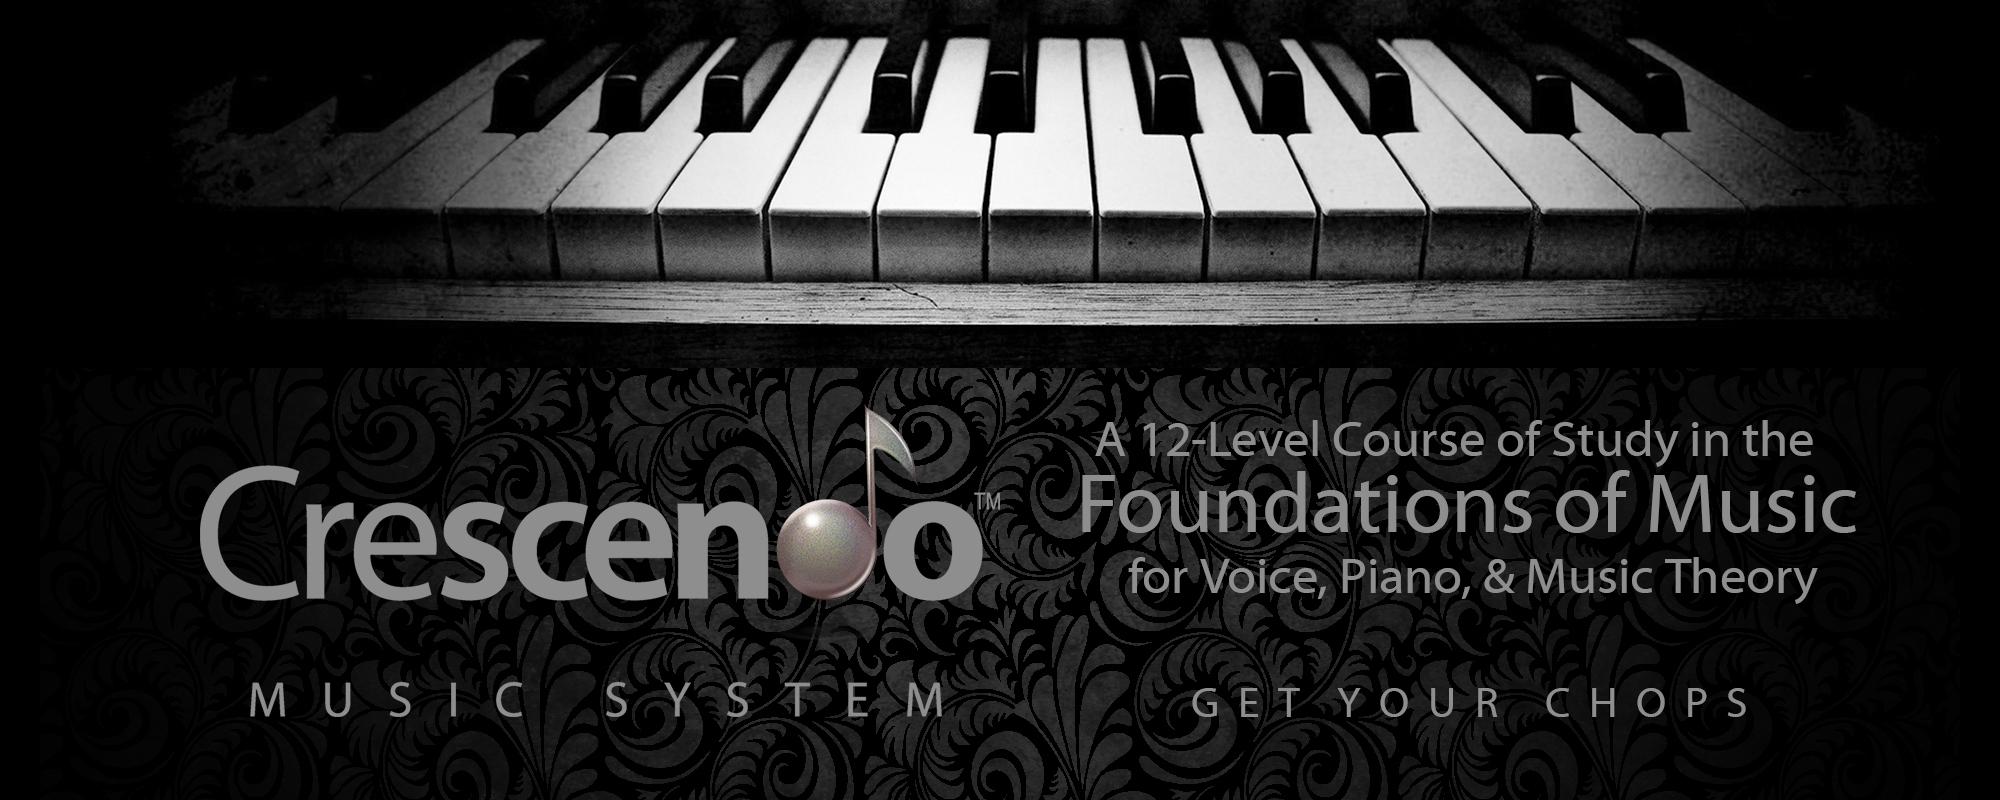 Crescendo Music System